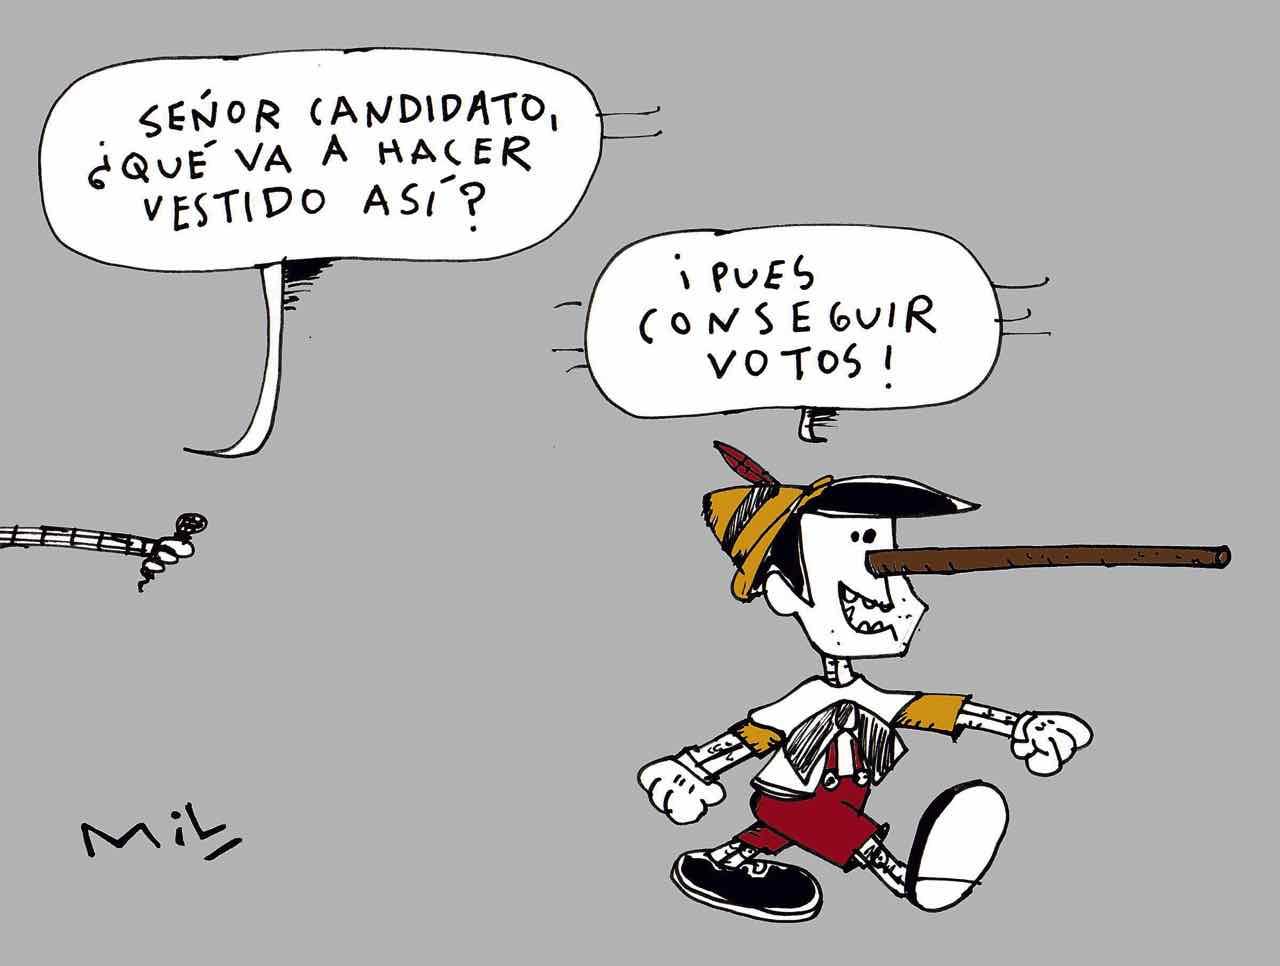 Caricatura 25 de Octubre de 2019